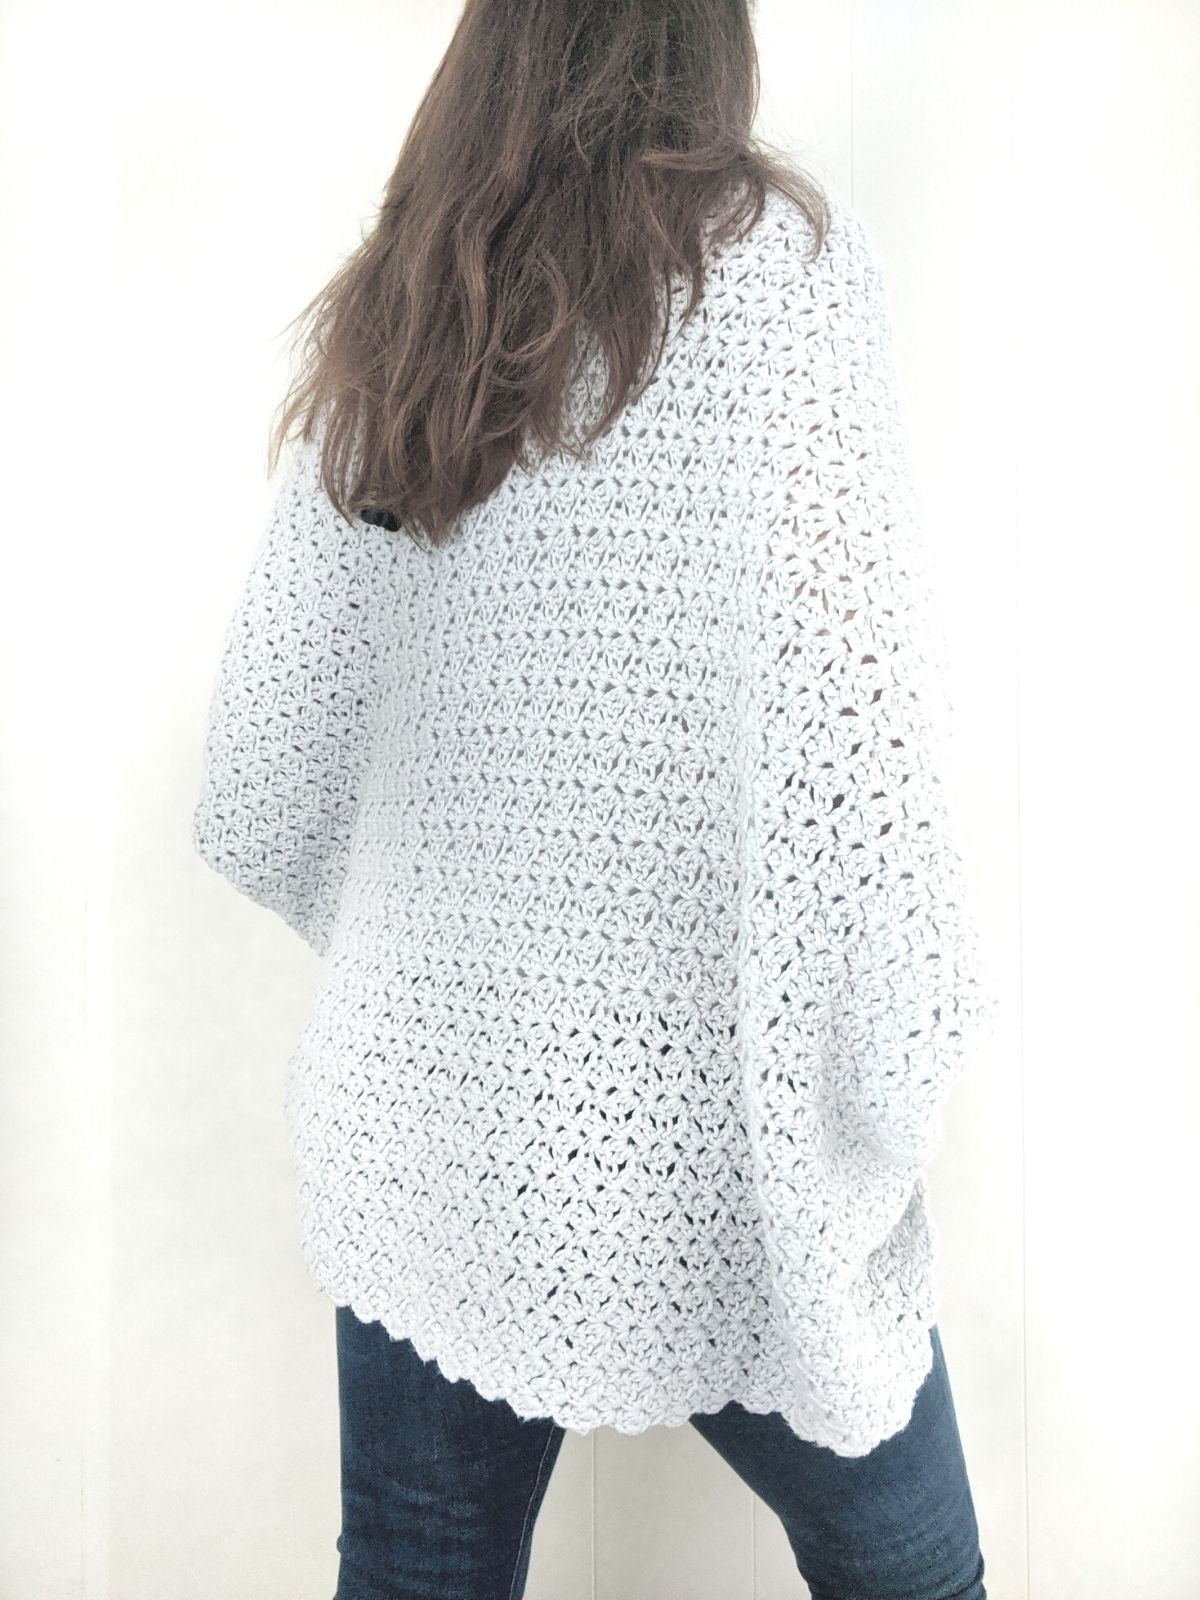 the back side a crochet shrug